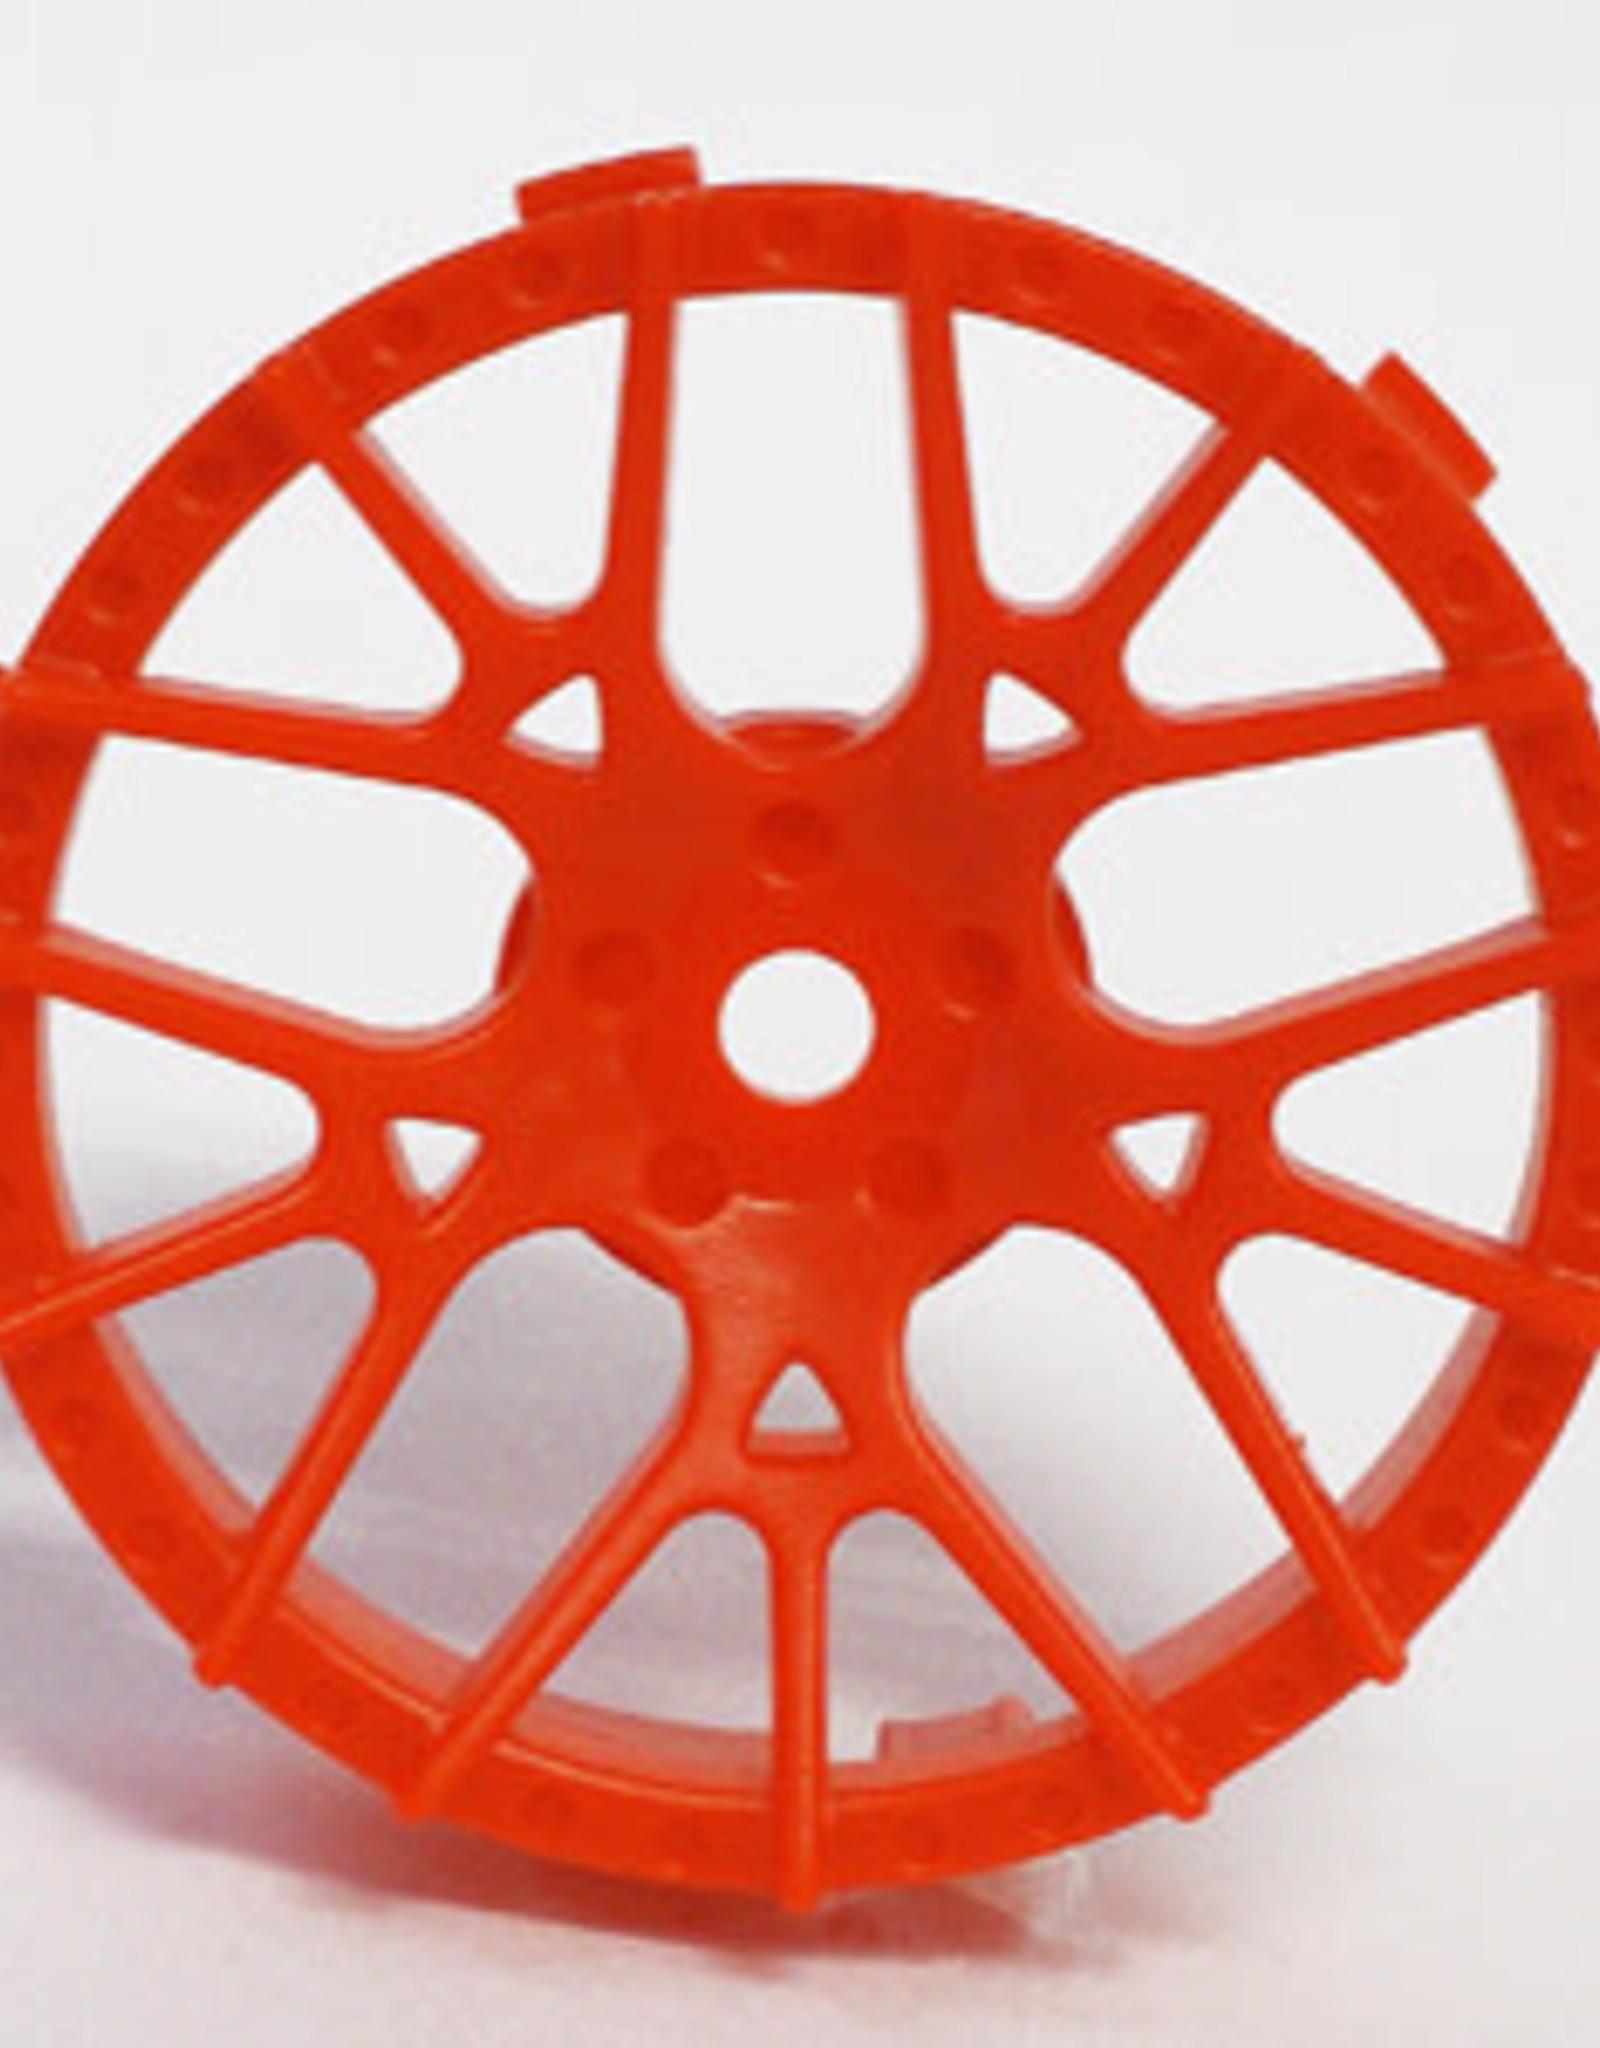 Tetsujin TT-7603 Super Rim Lycoris Red Disks 2pcs.  by Tetsujin